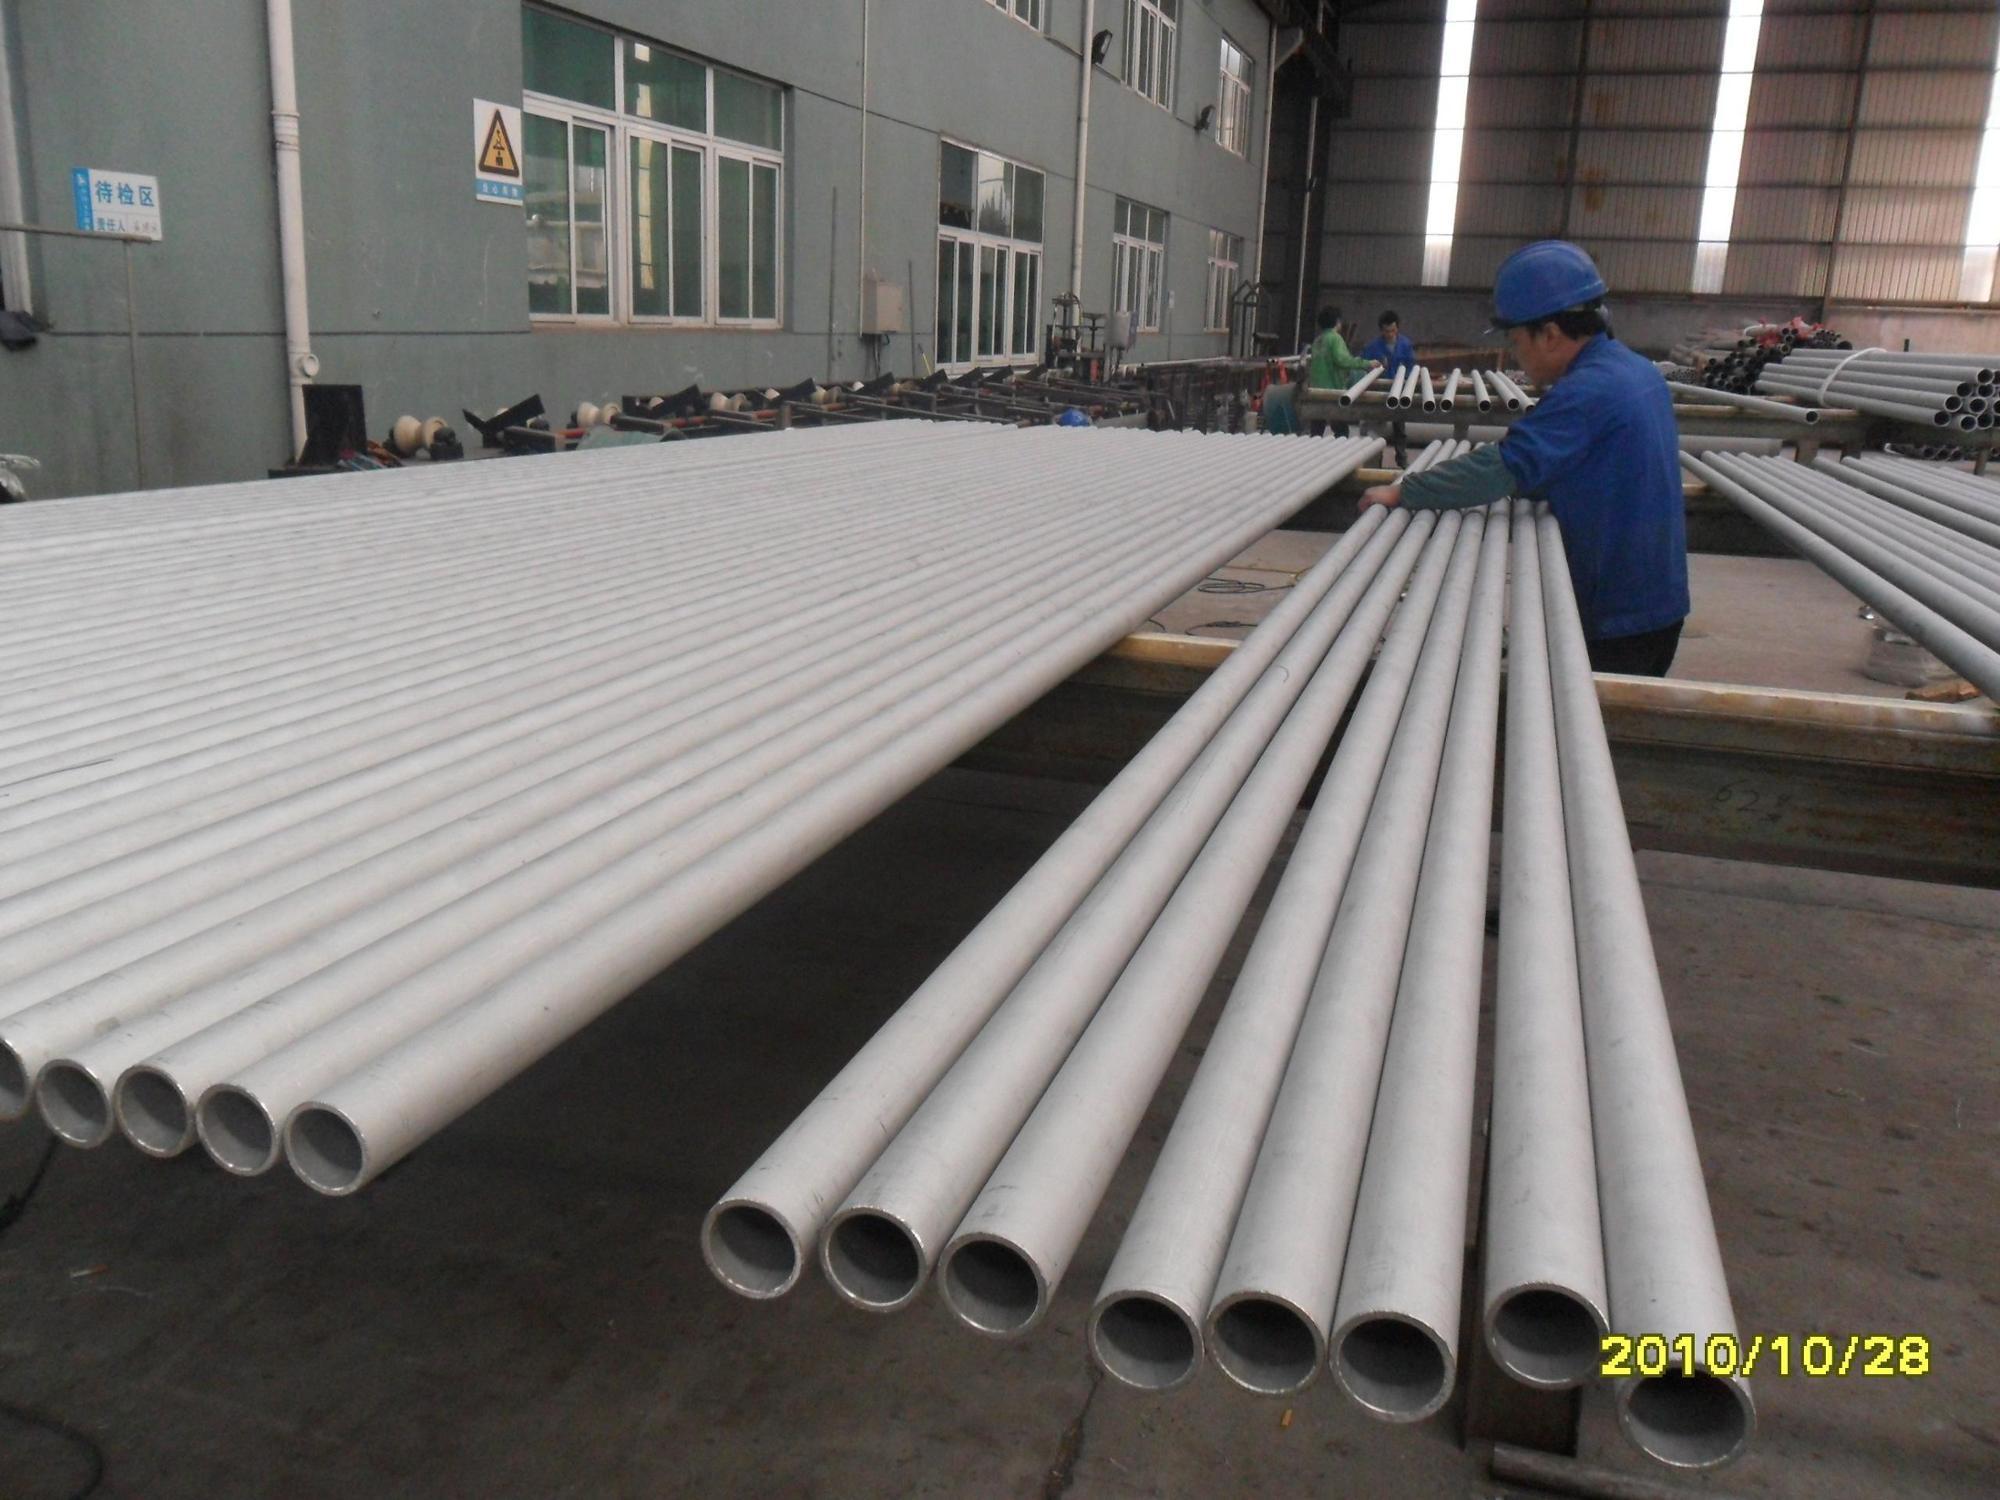 15NiCuMoNb5 W-nr 1.6368 20mm Kalınlığında Çelik Boru